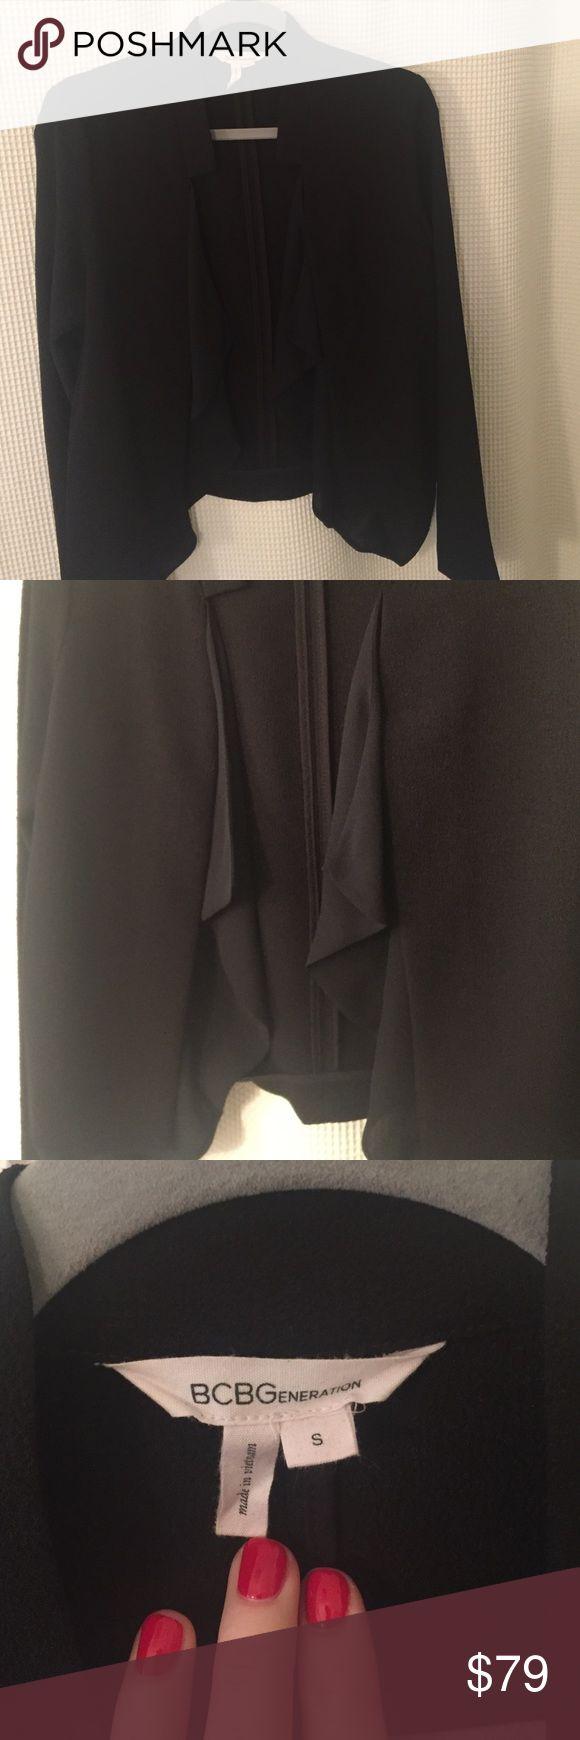 BCBGeneration jacket Good condition- minor signs of wear BCBGeneration Jackets & Coats Blazers